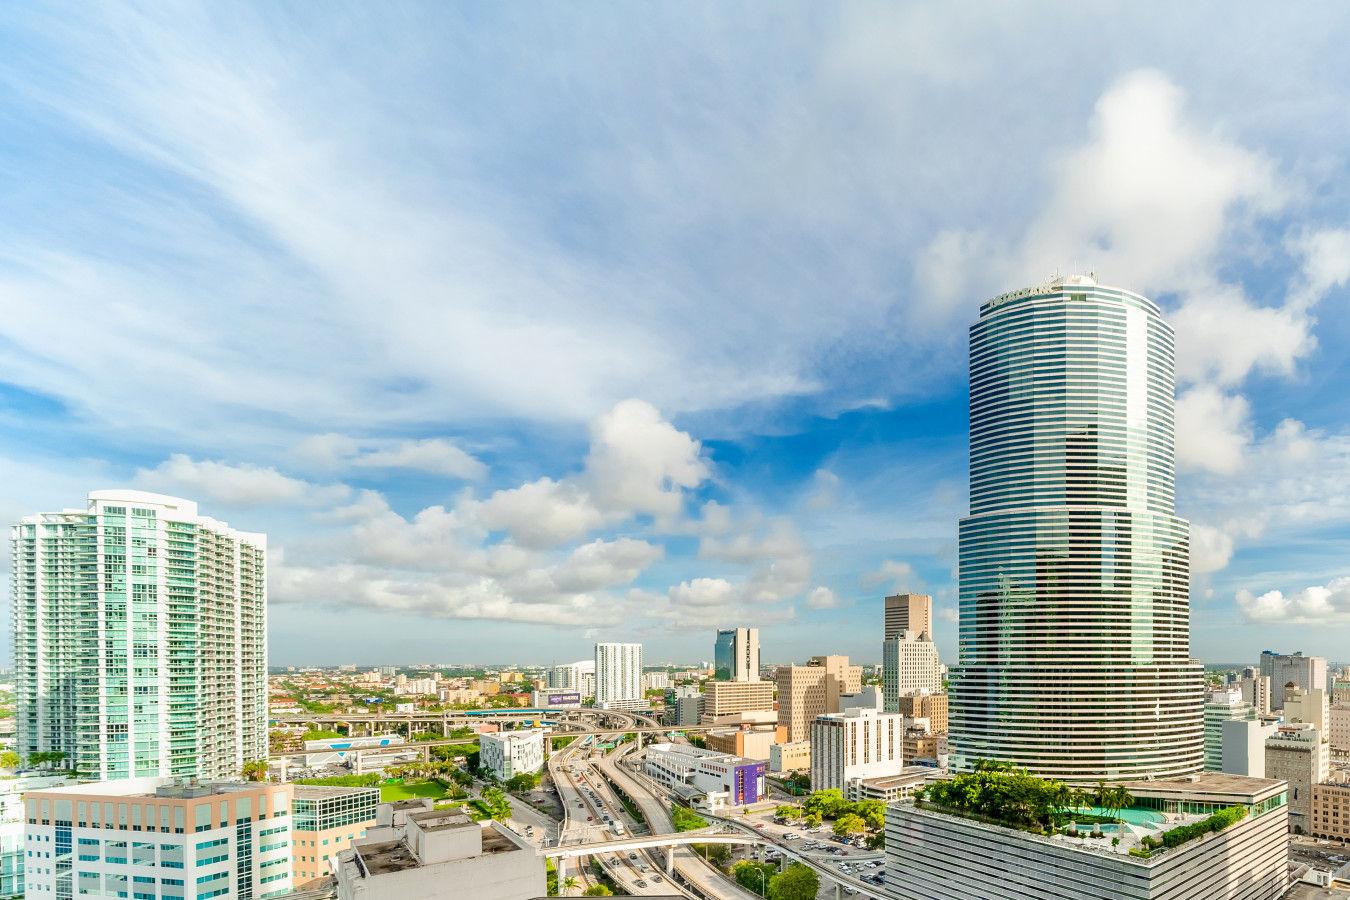 City View from Hyatt Regency Miami